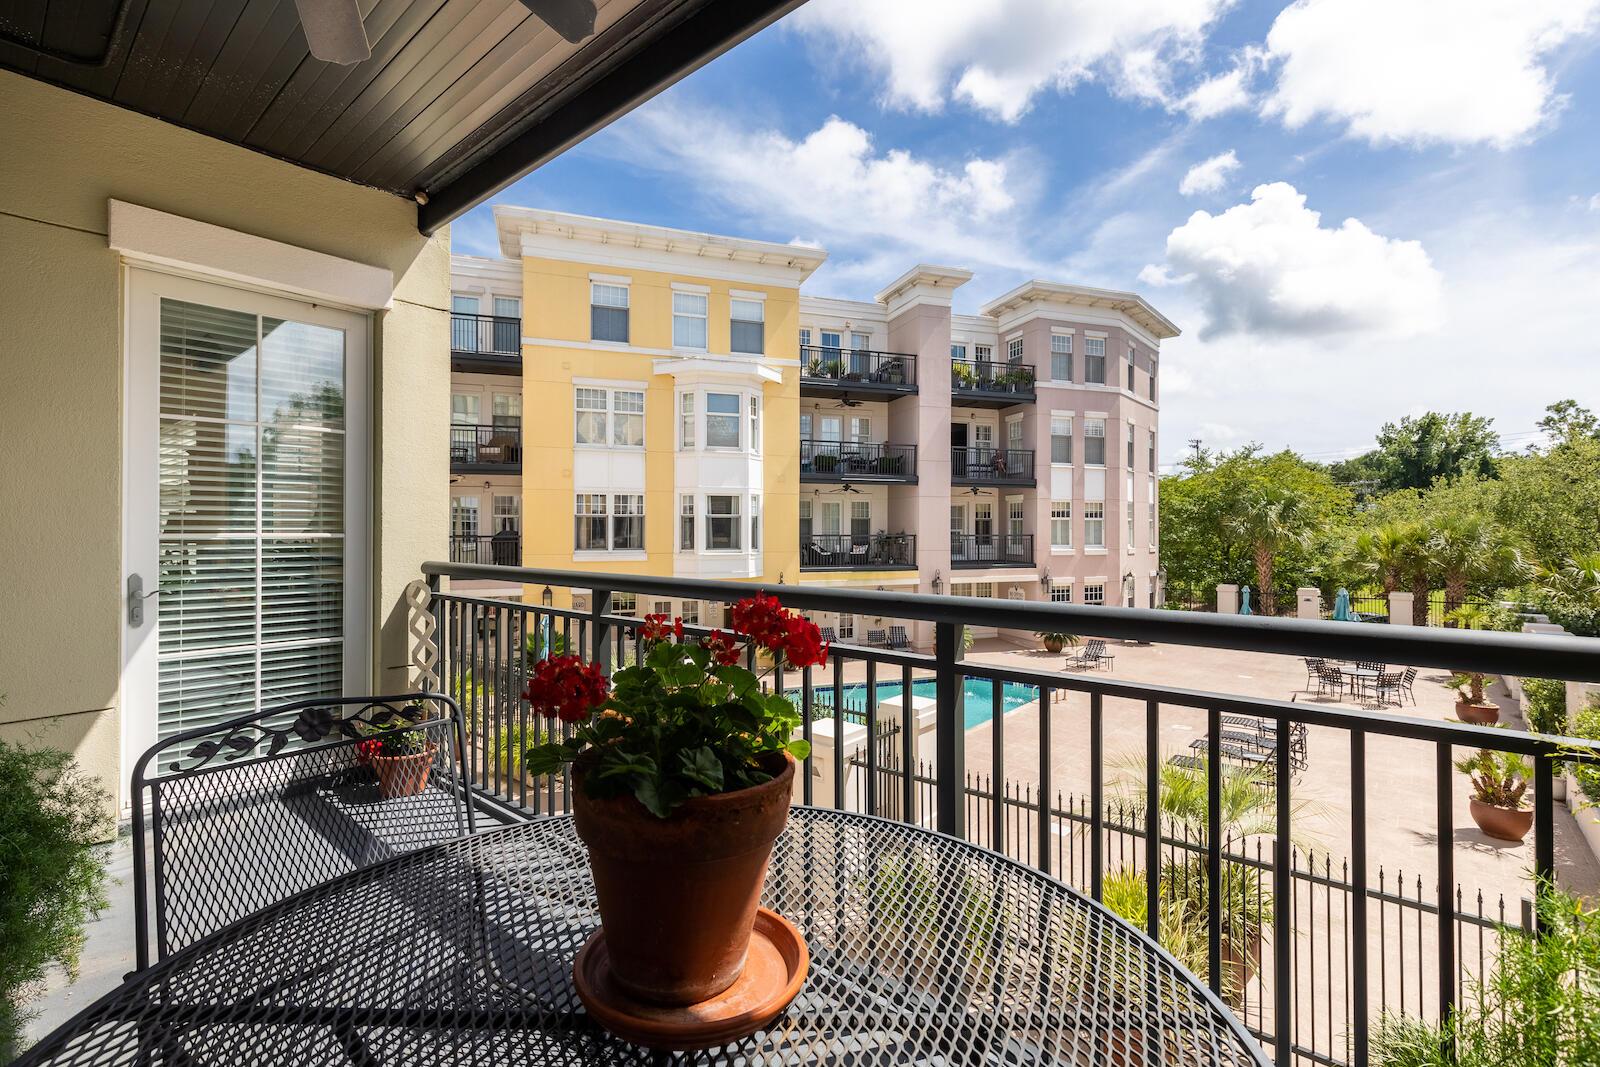 Albemarle Condos For Sale - 498 Albemarle, Charleston, SC - 6